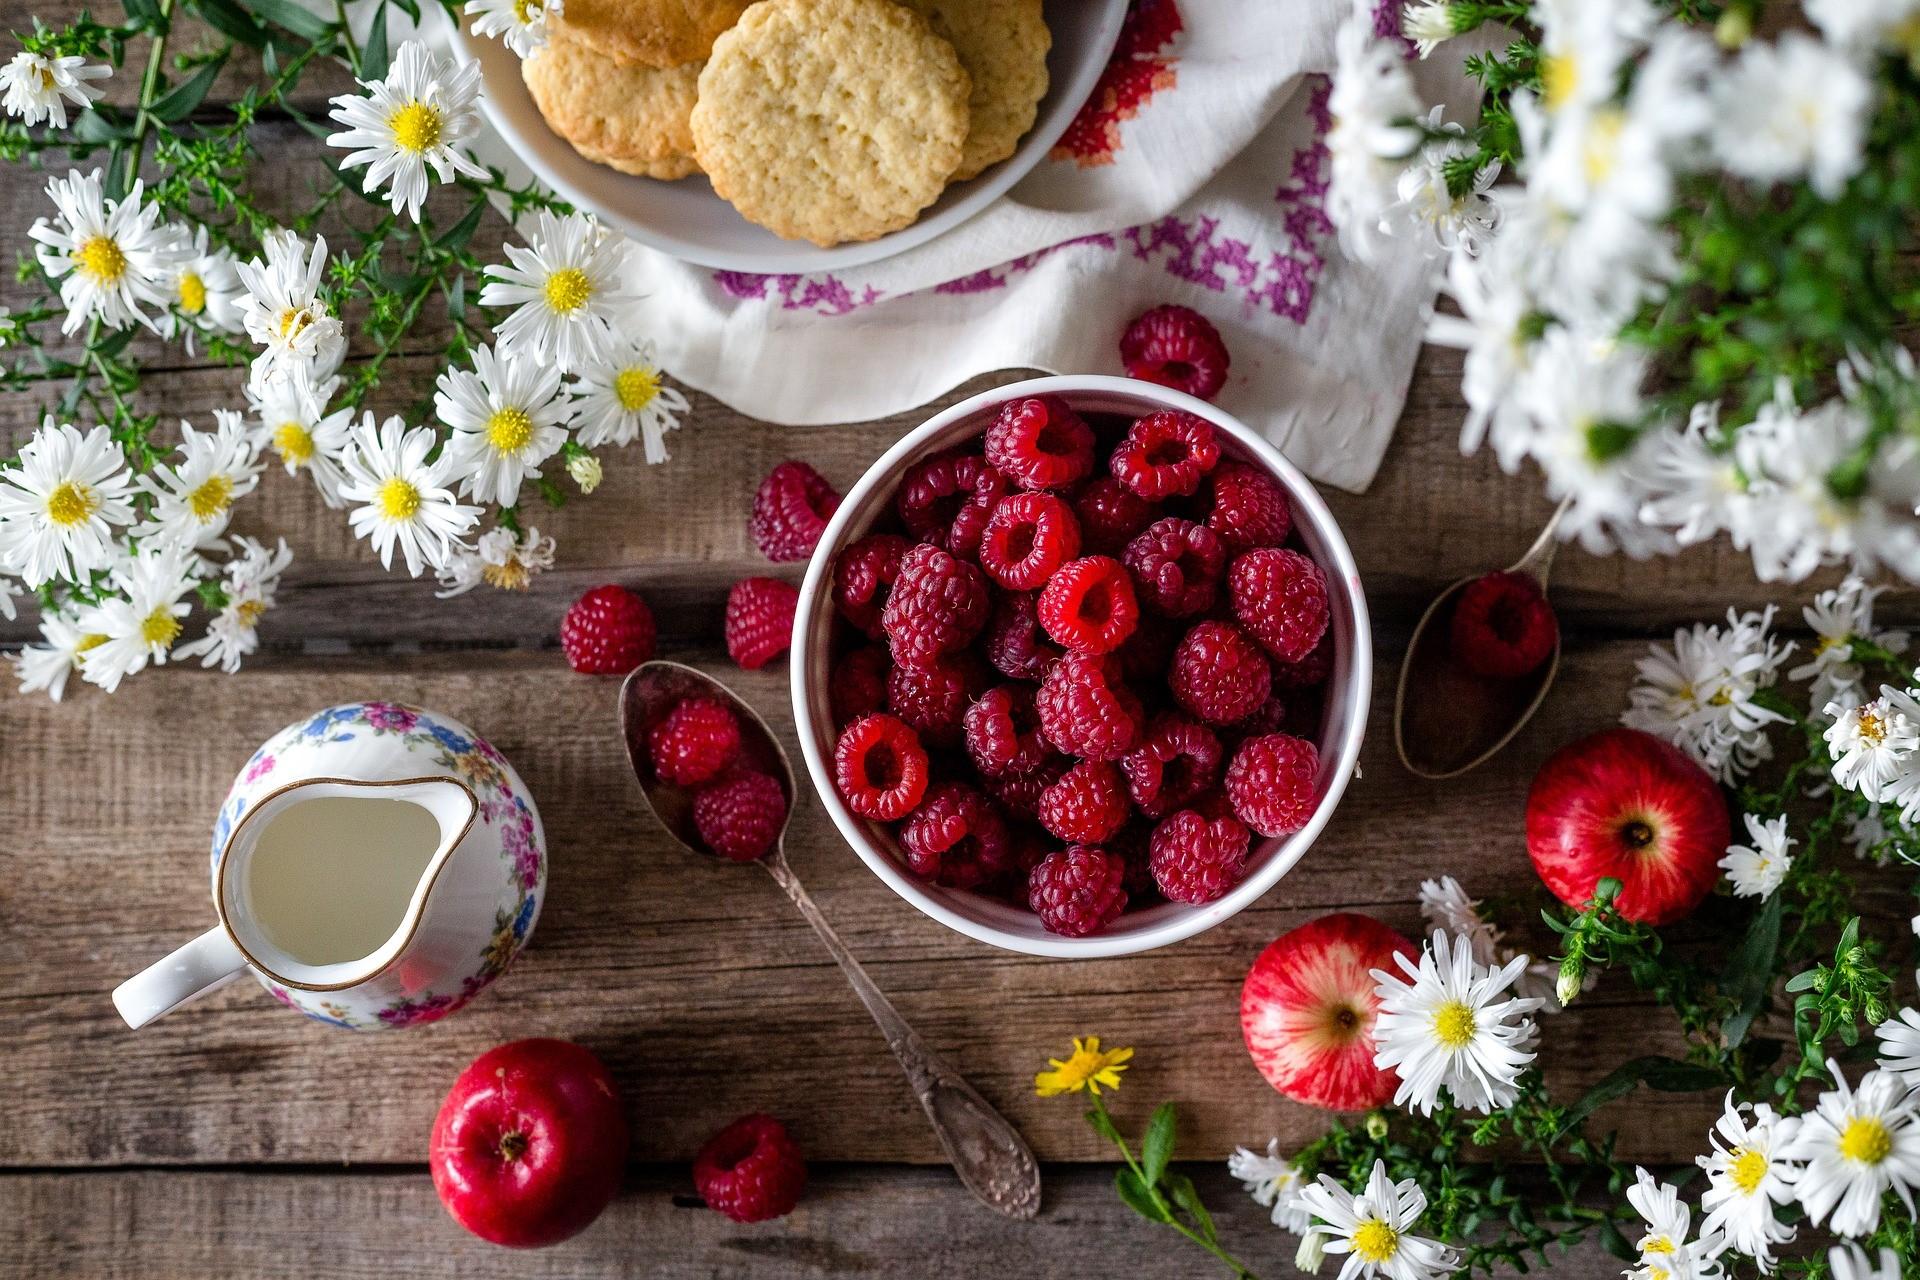 raspberry-2023404_1920